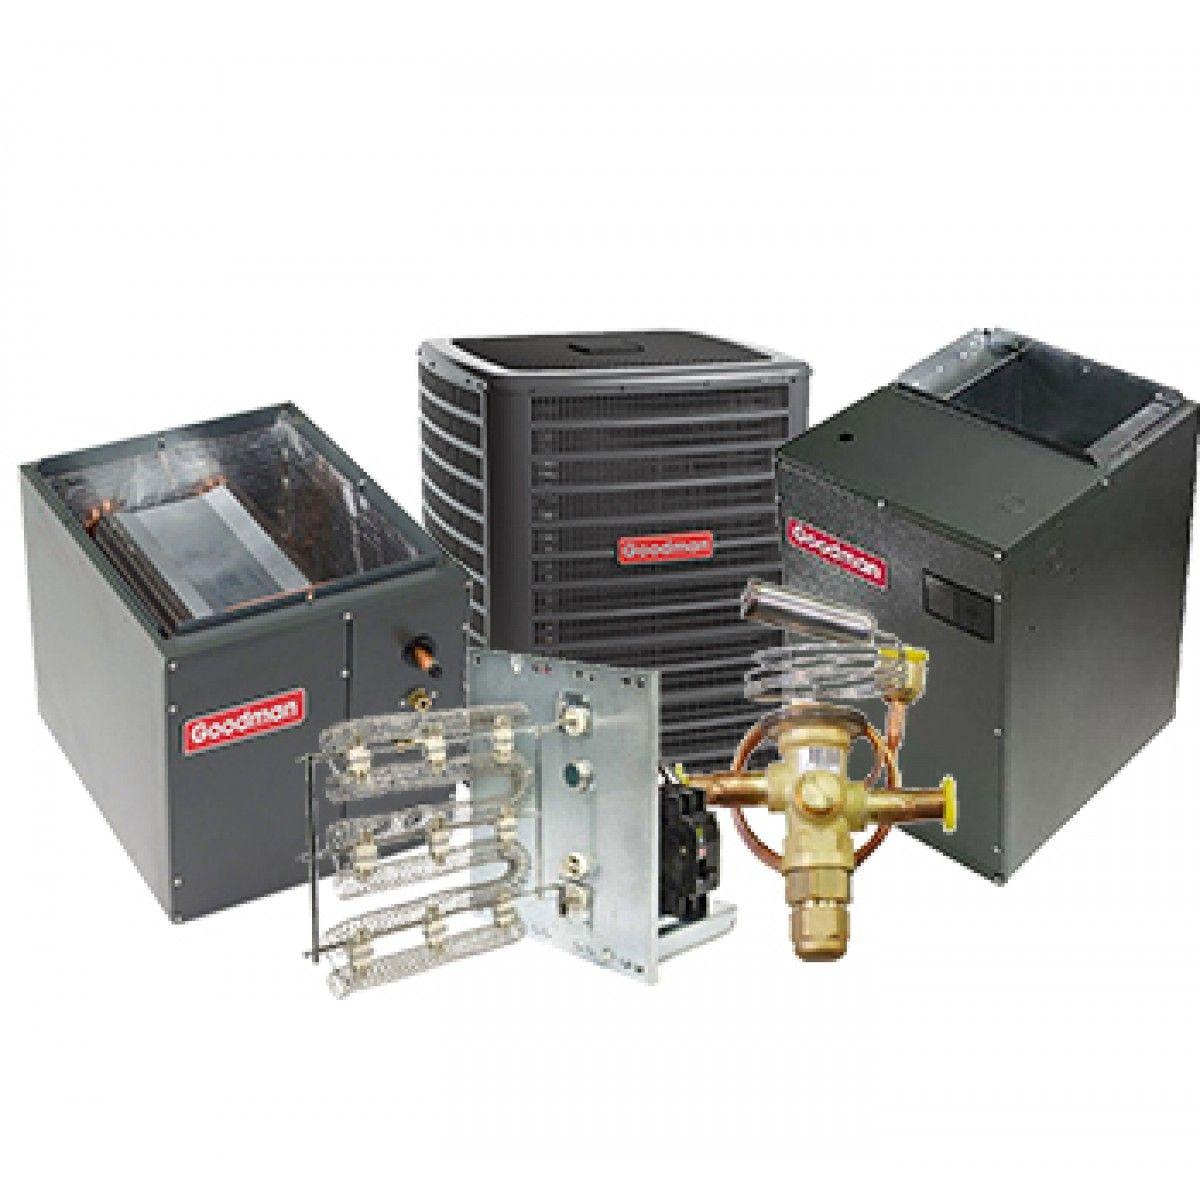 2 Ton Goodman 18 SEER R410A Two-Stage Variable Speed Air Conditioner Split System 10 Kilowatt